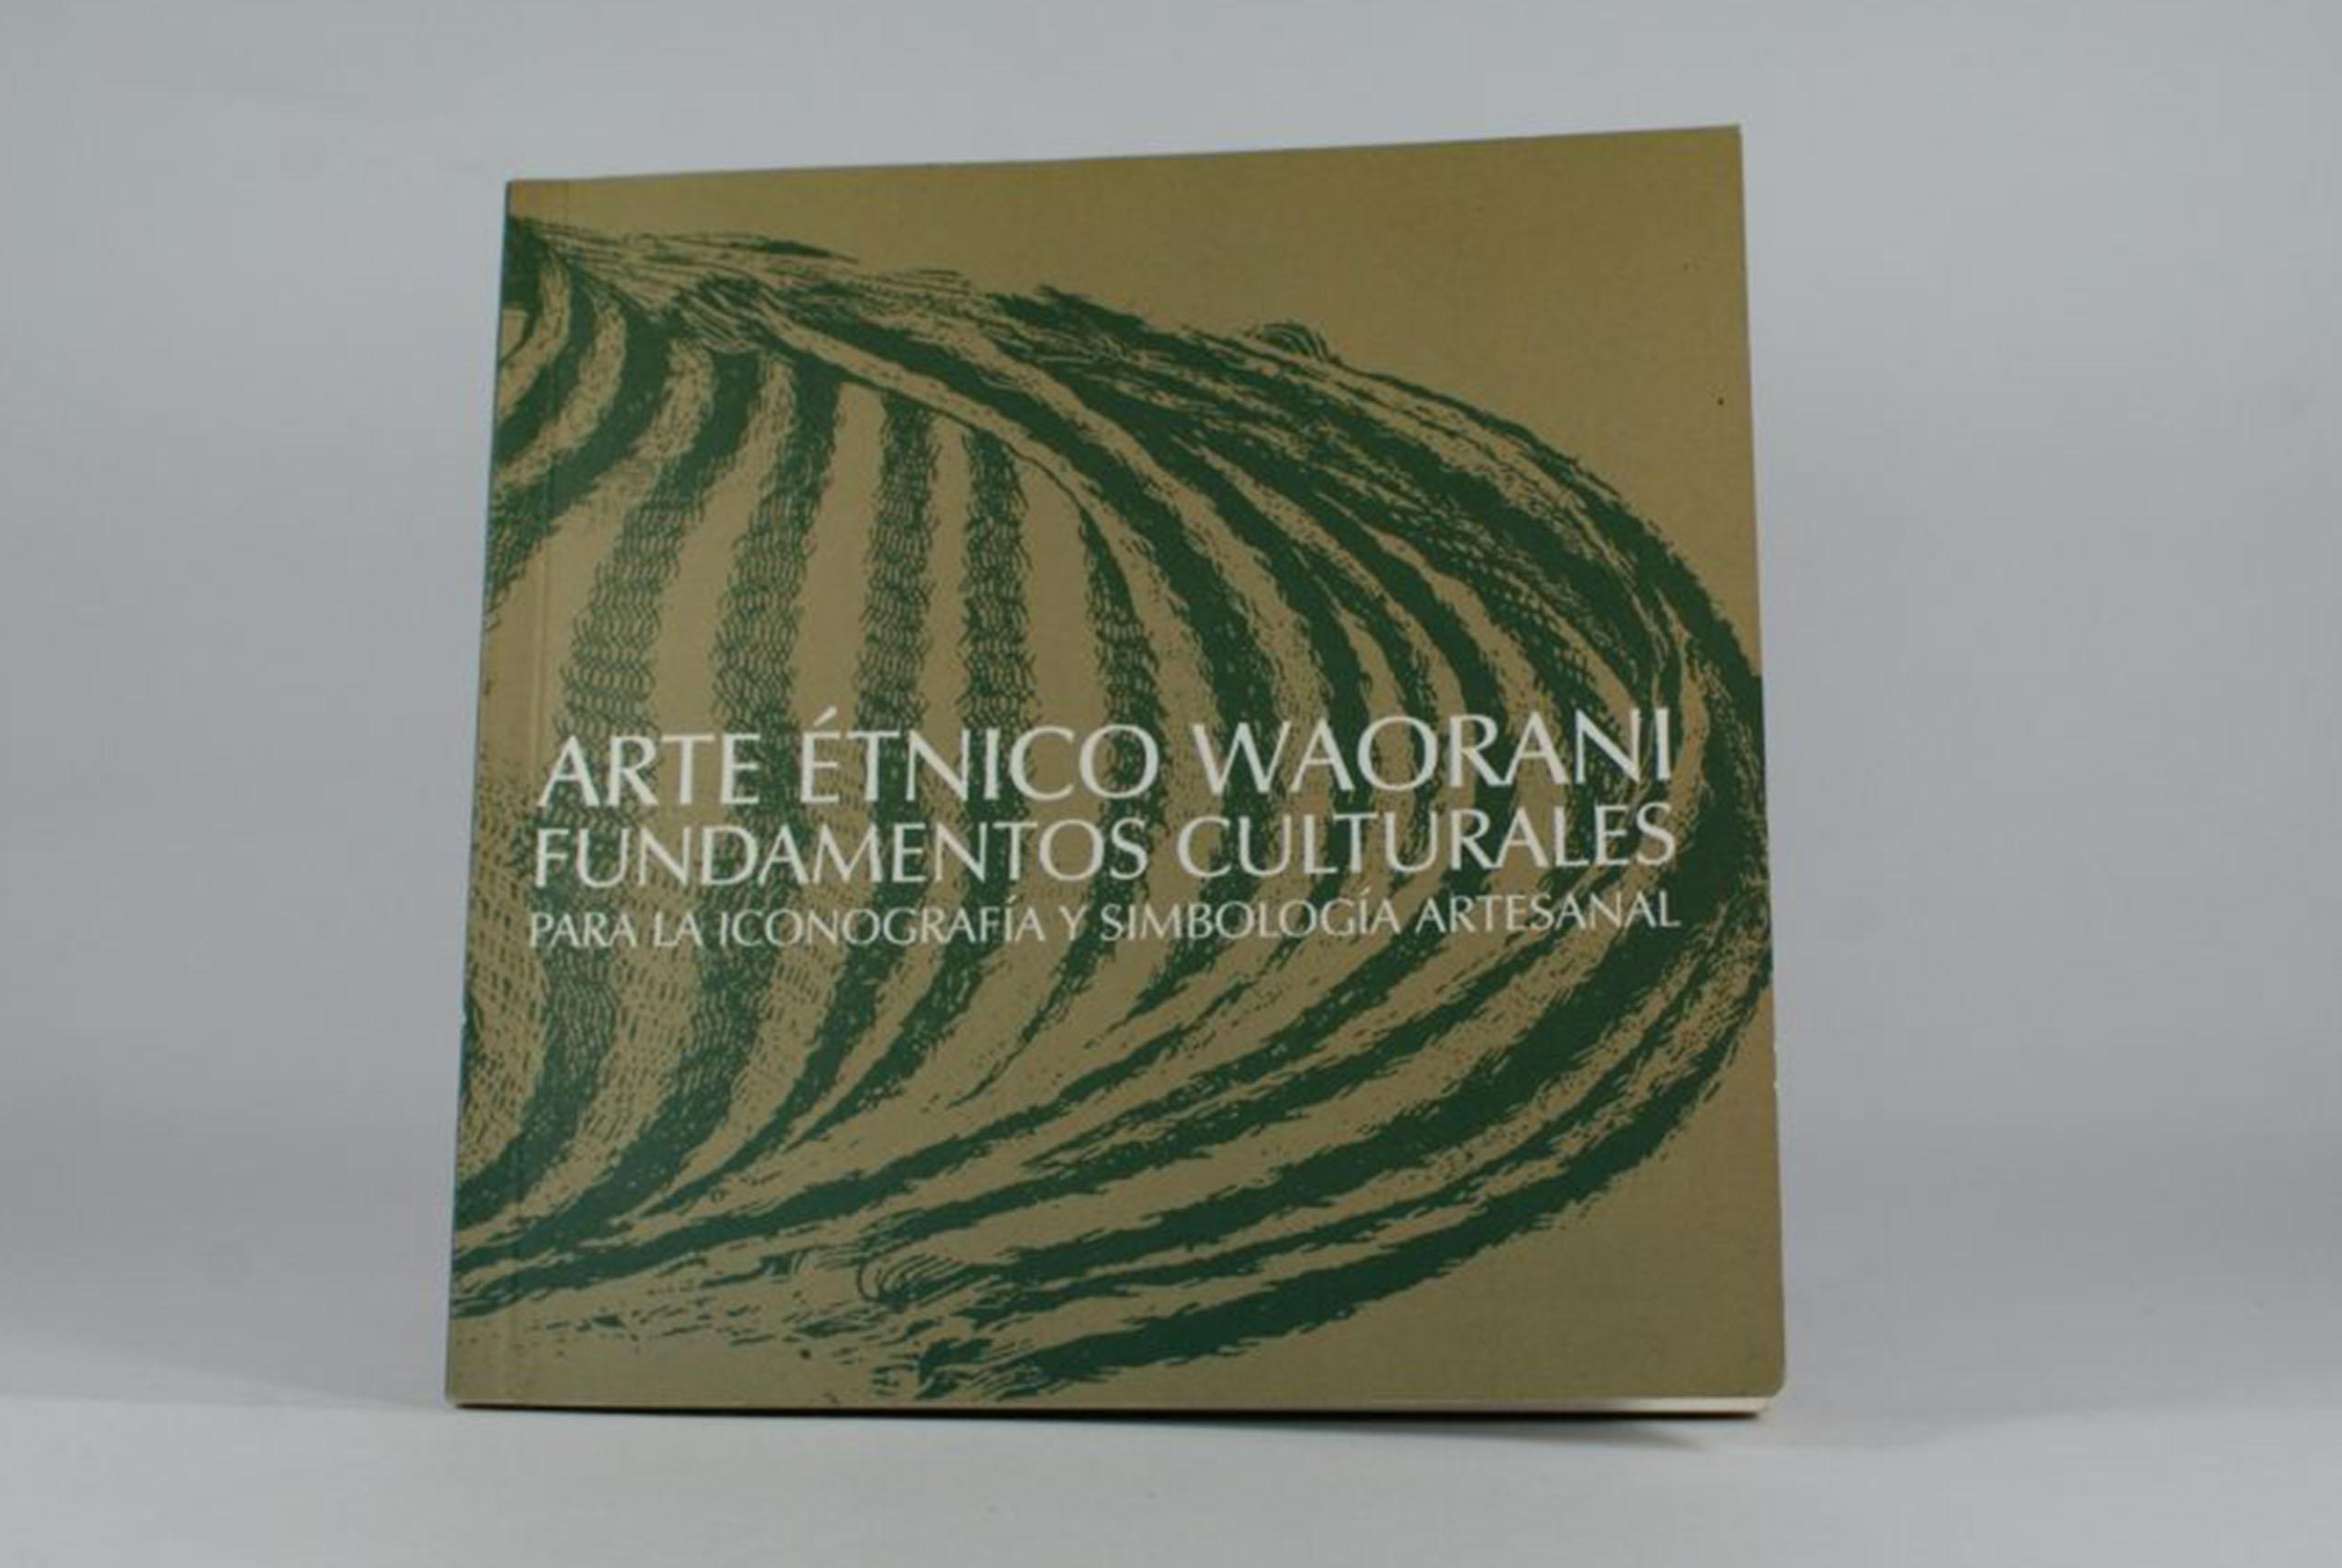 LB-10-ARTE-ETNICO-WAORANI-PASTA-SUAVE_1